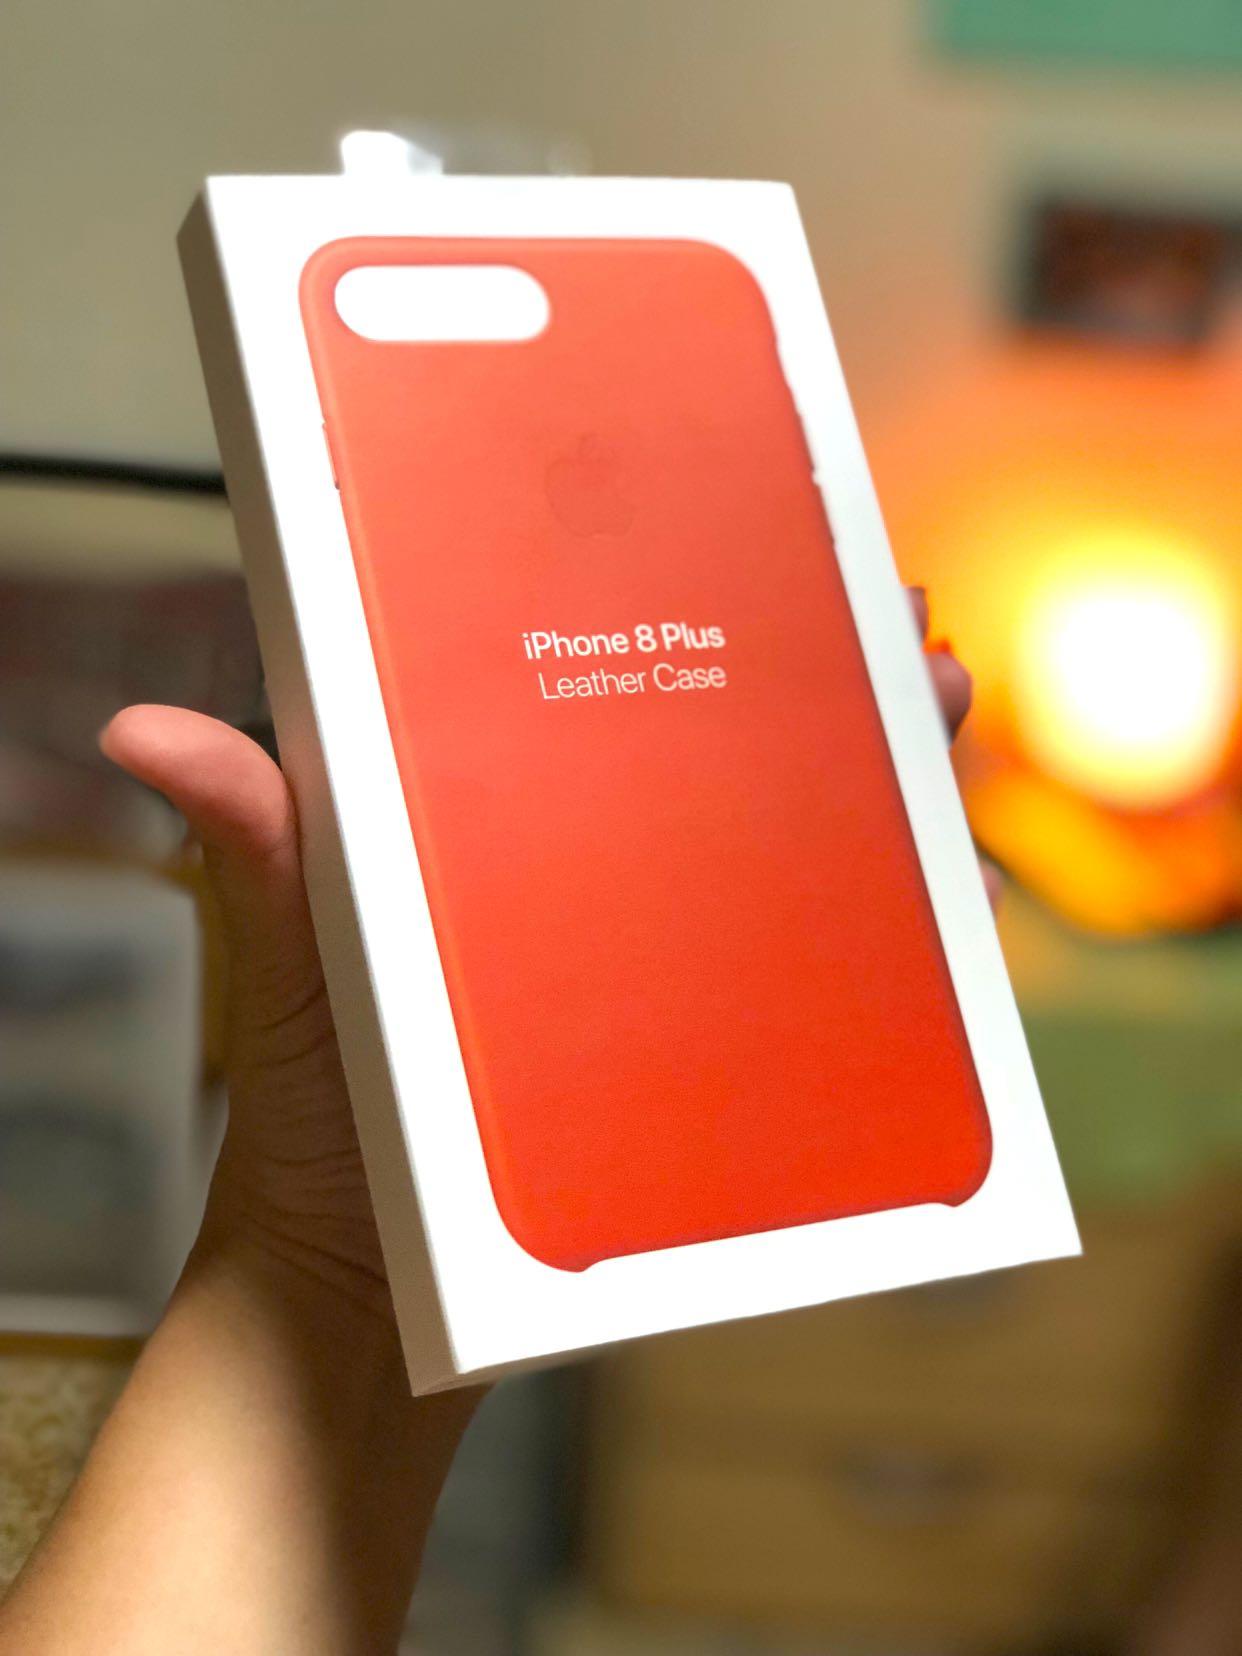 brand new 0c483 789e9 APPLE iPhone 8 Plus leather case - bright orange